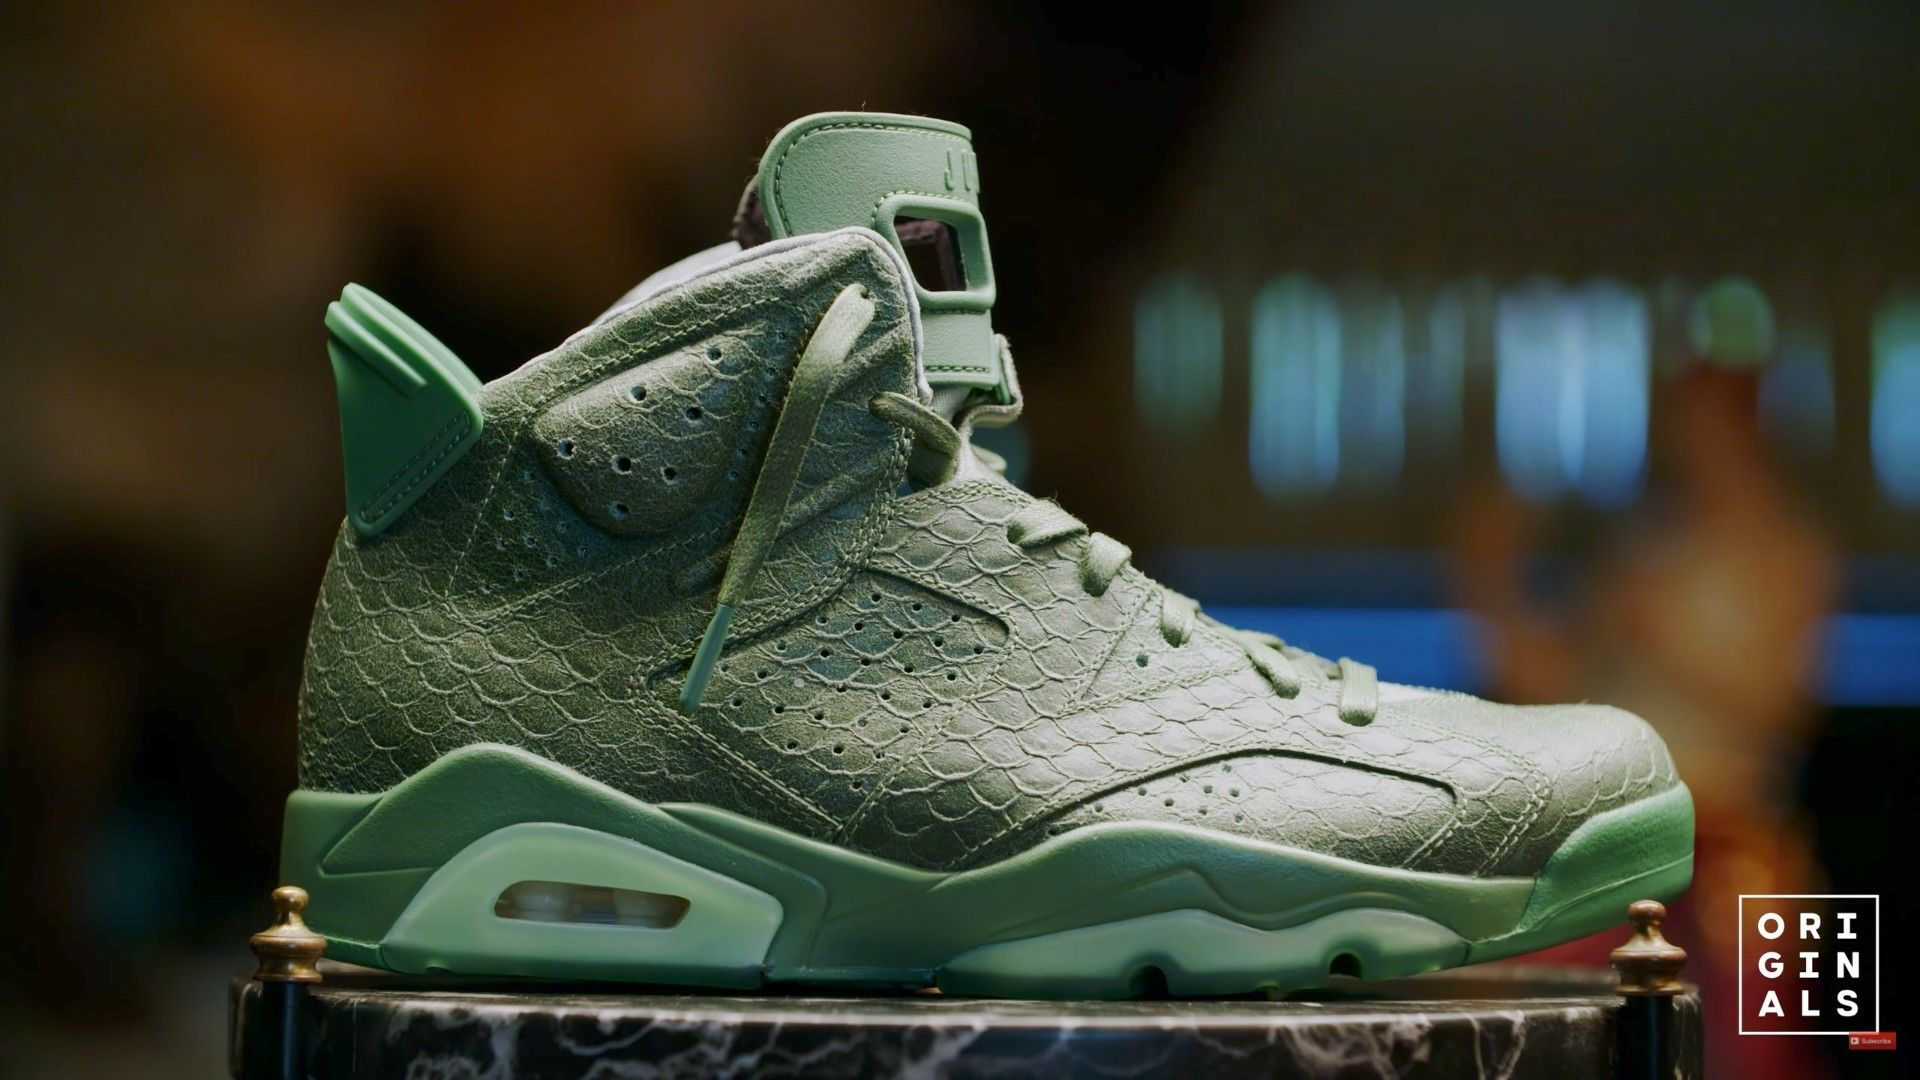 Macklemore exclusive Jordan 6 Cheap Jordans bcfa10b3a06